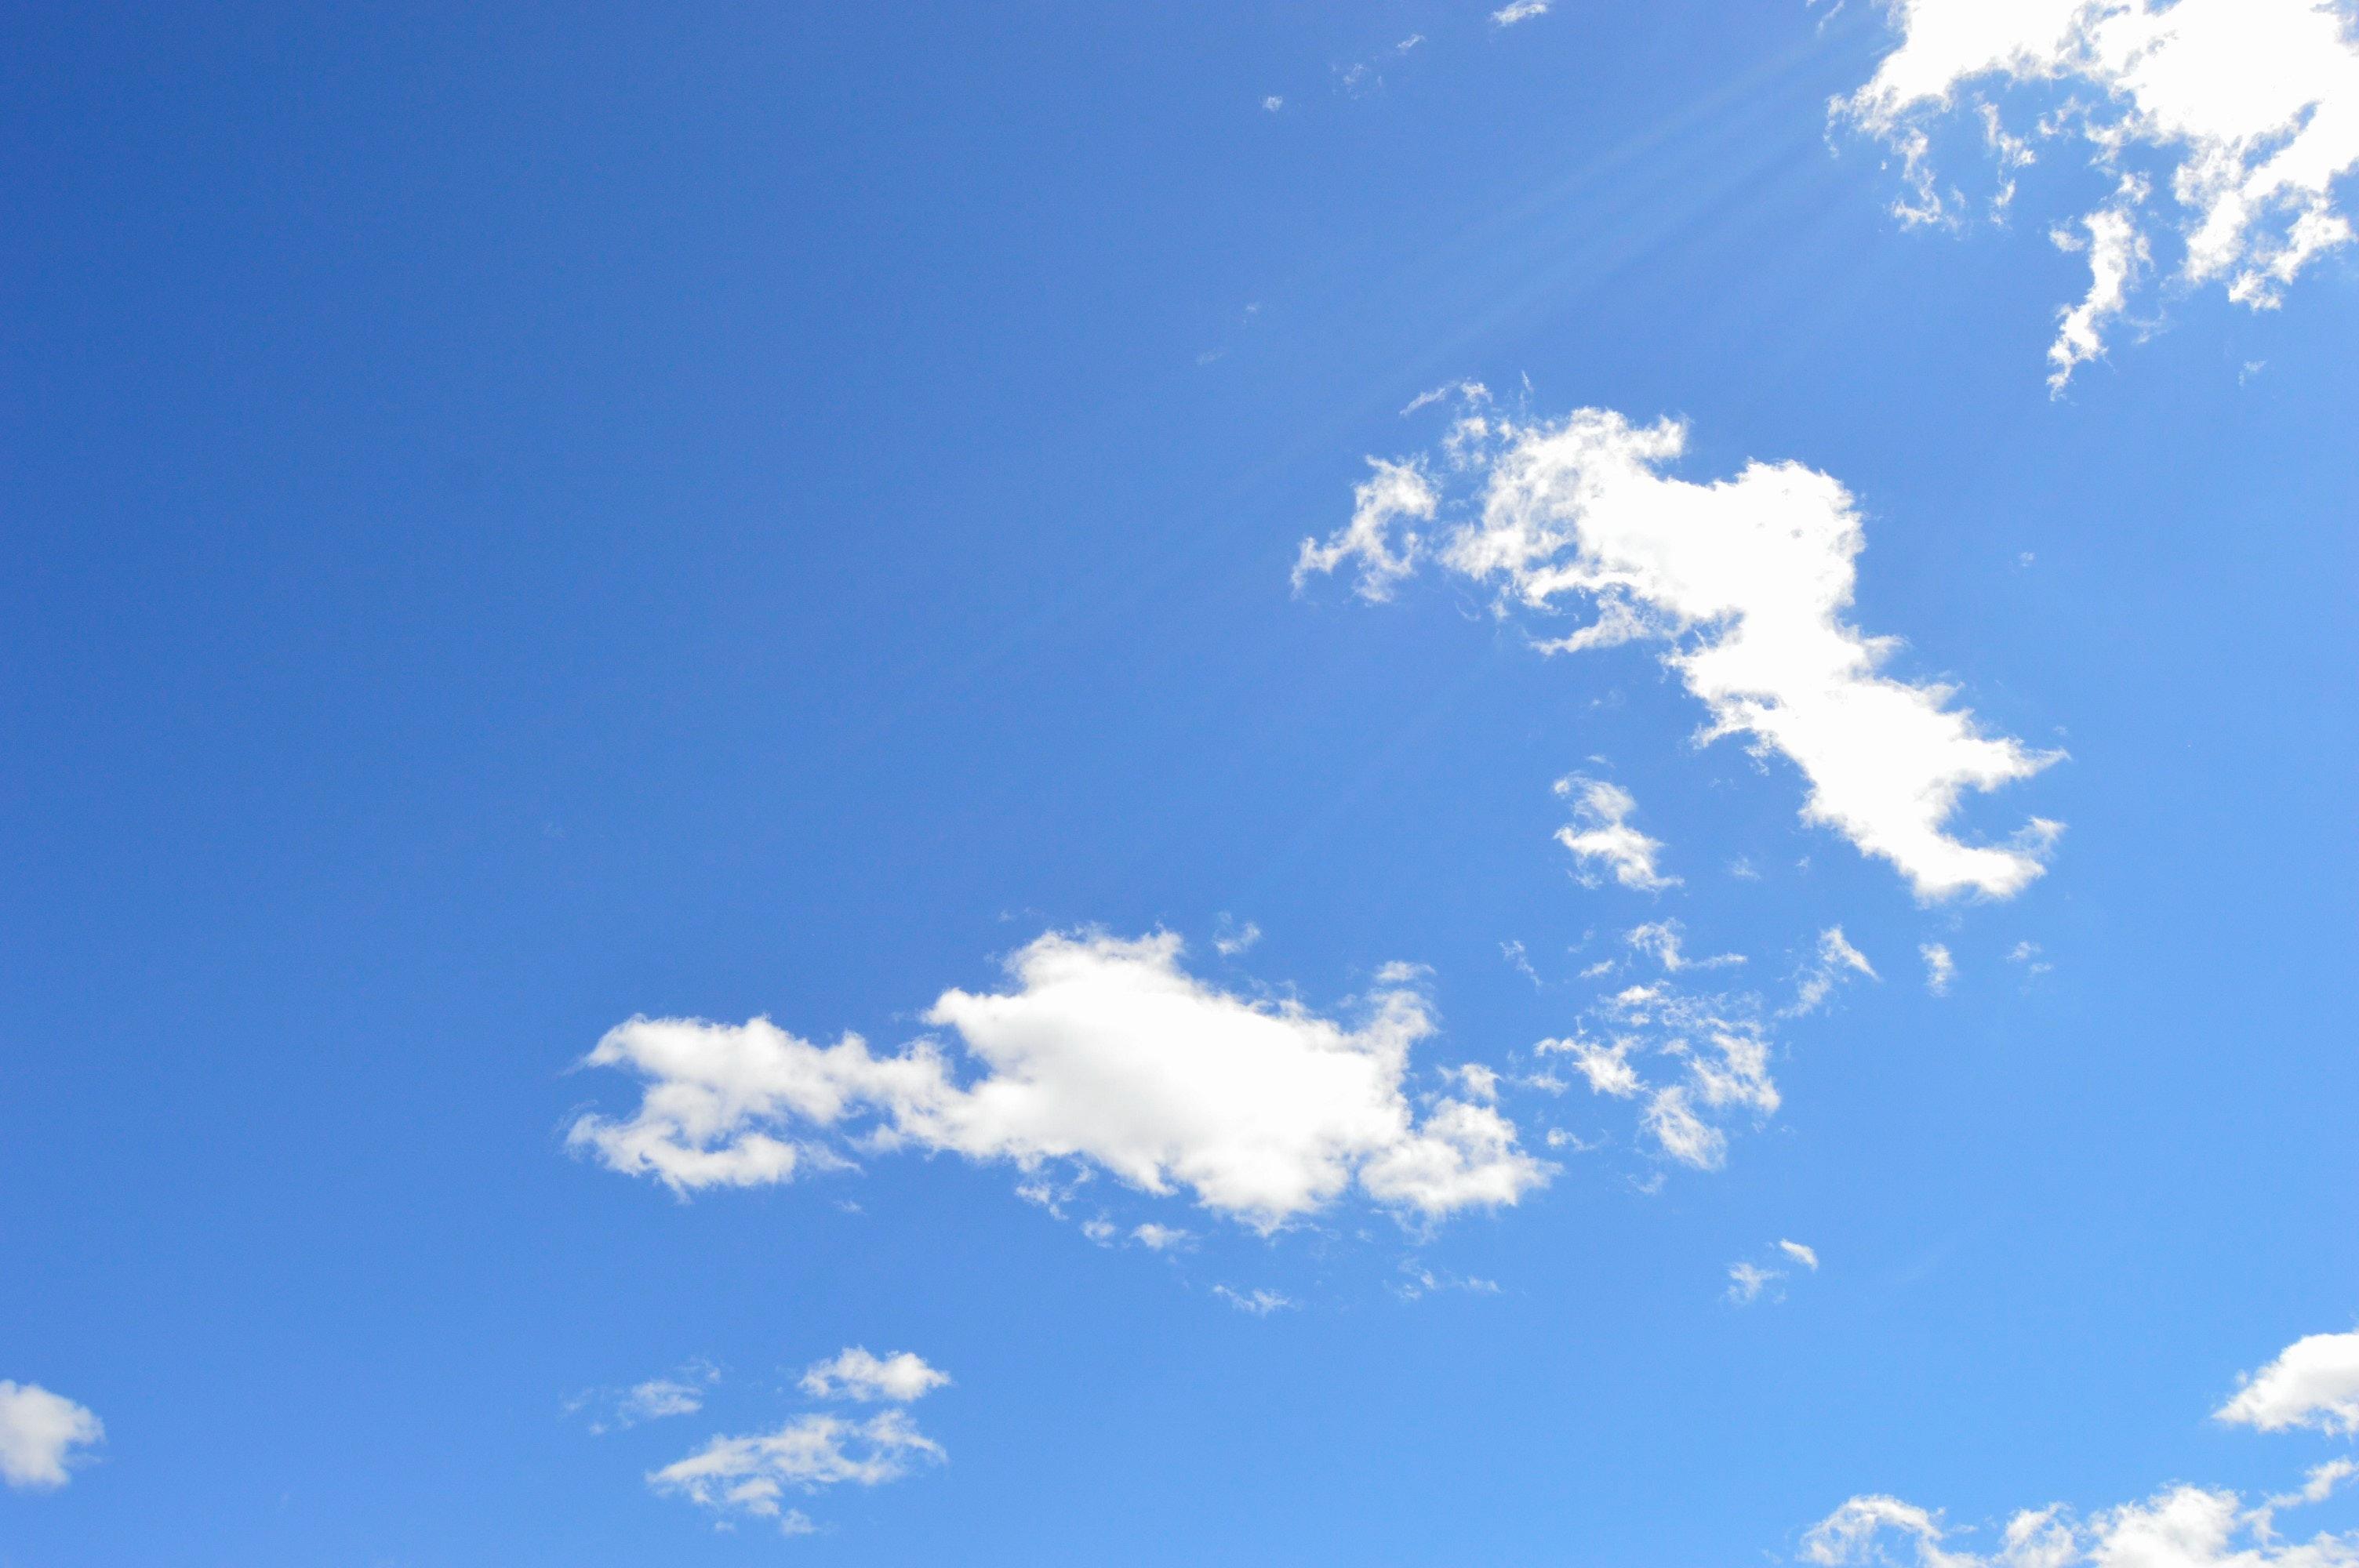 Beautiful blue sky with clouds | Born Brilliant image stock  |Light Blue Sky Clouds